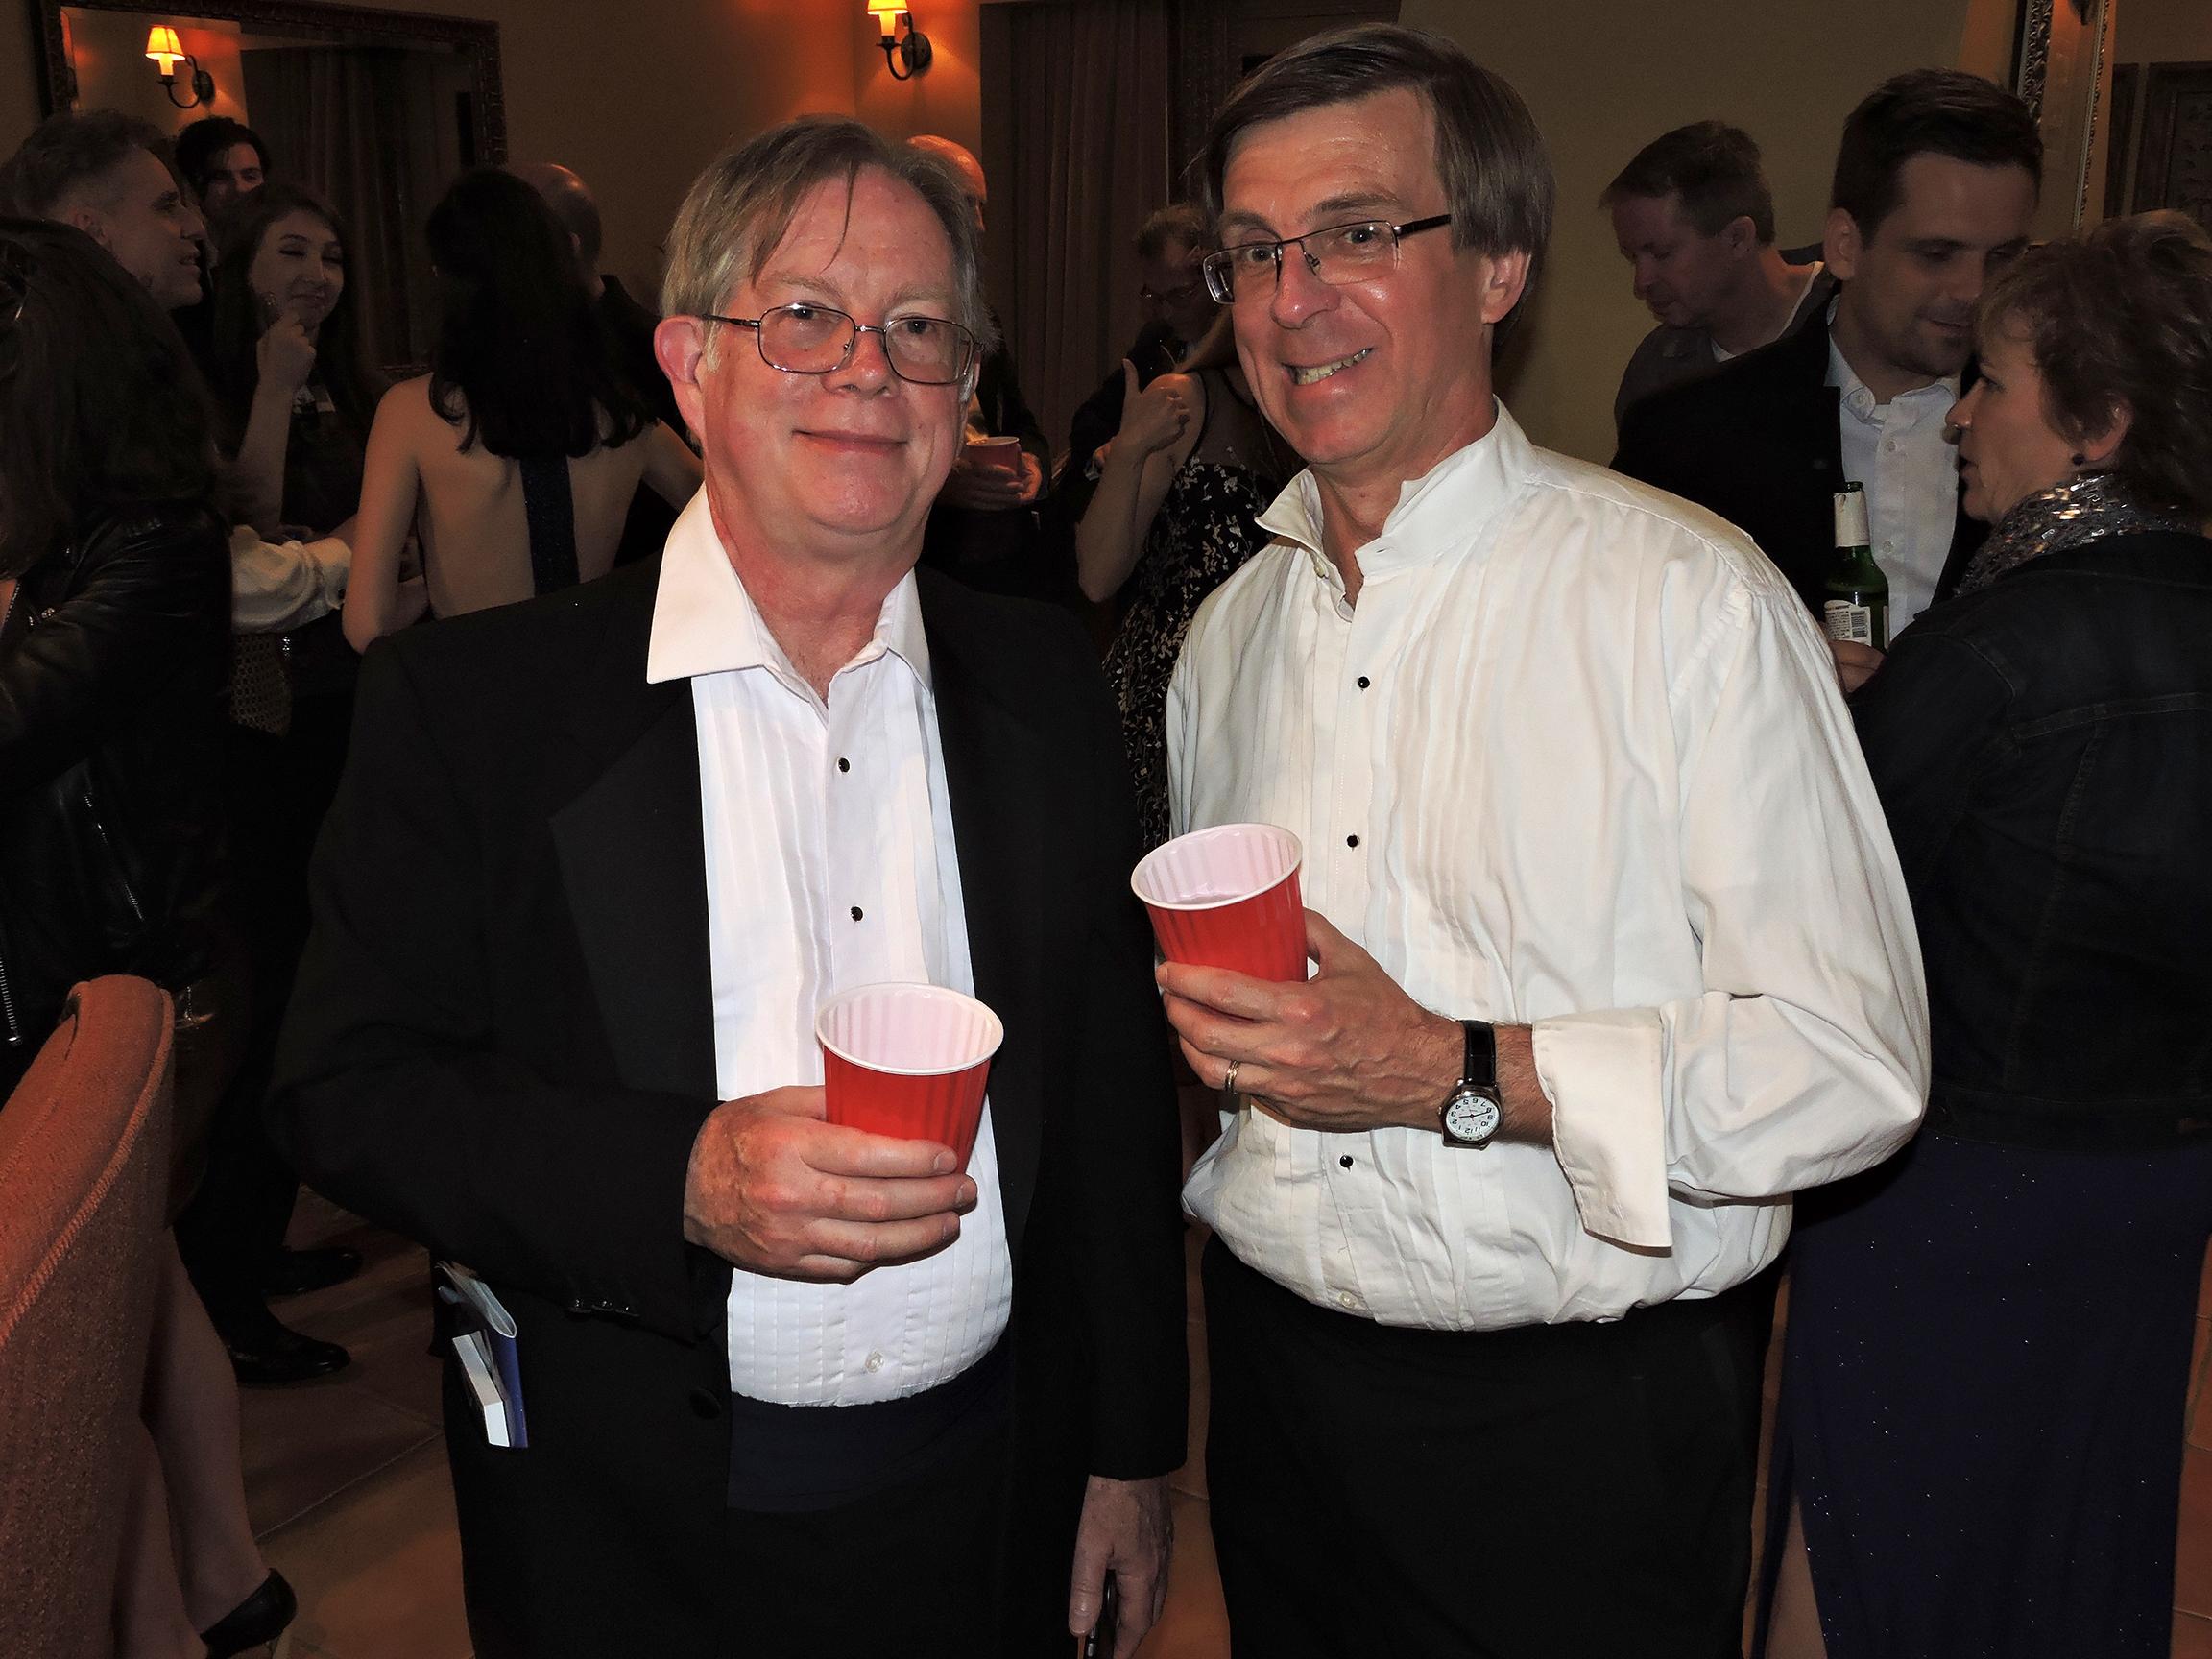 Greg Walker (left) and Bill Janocha